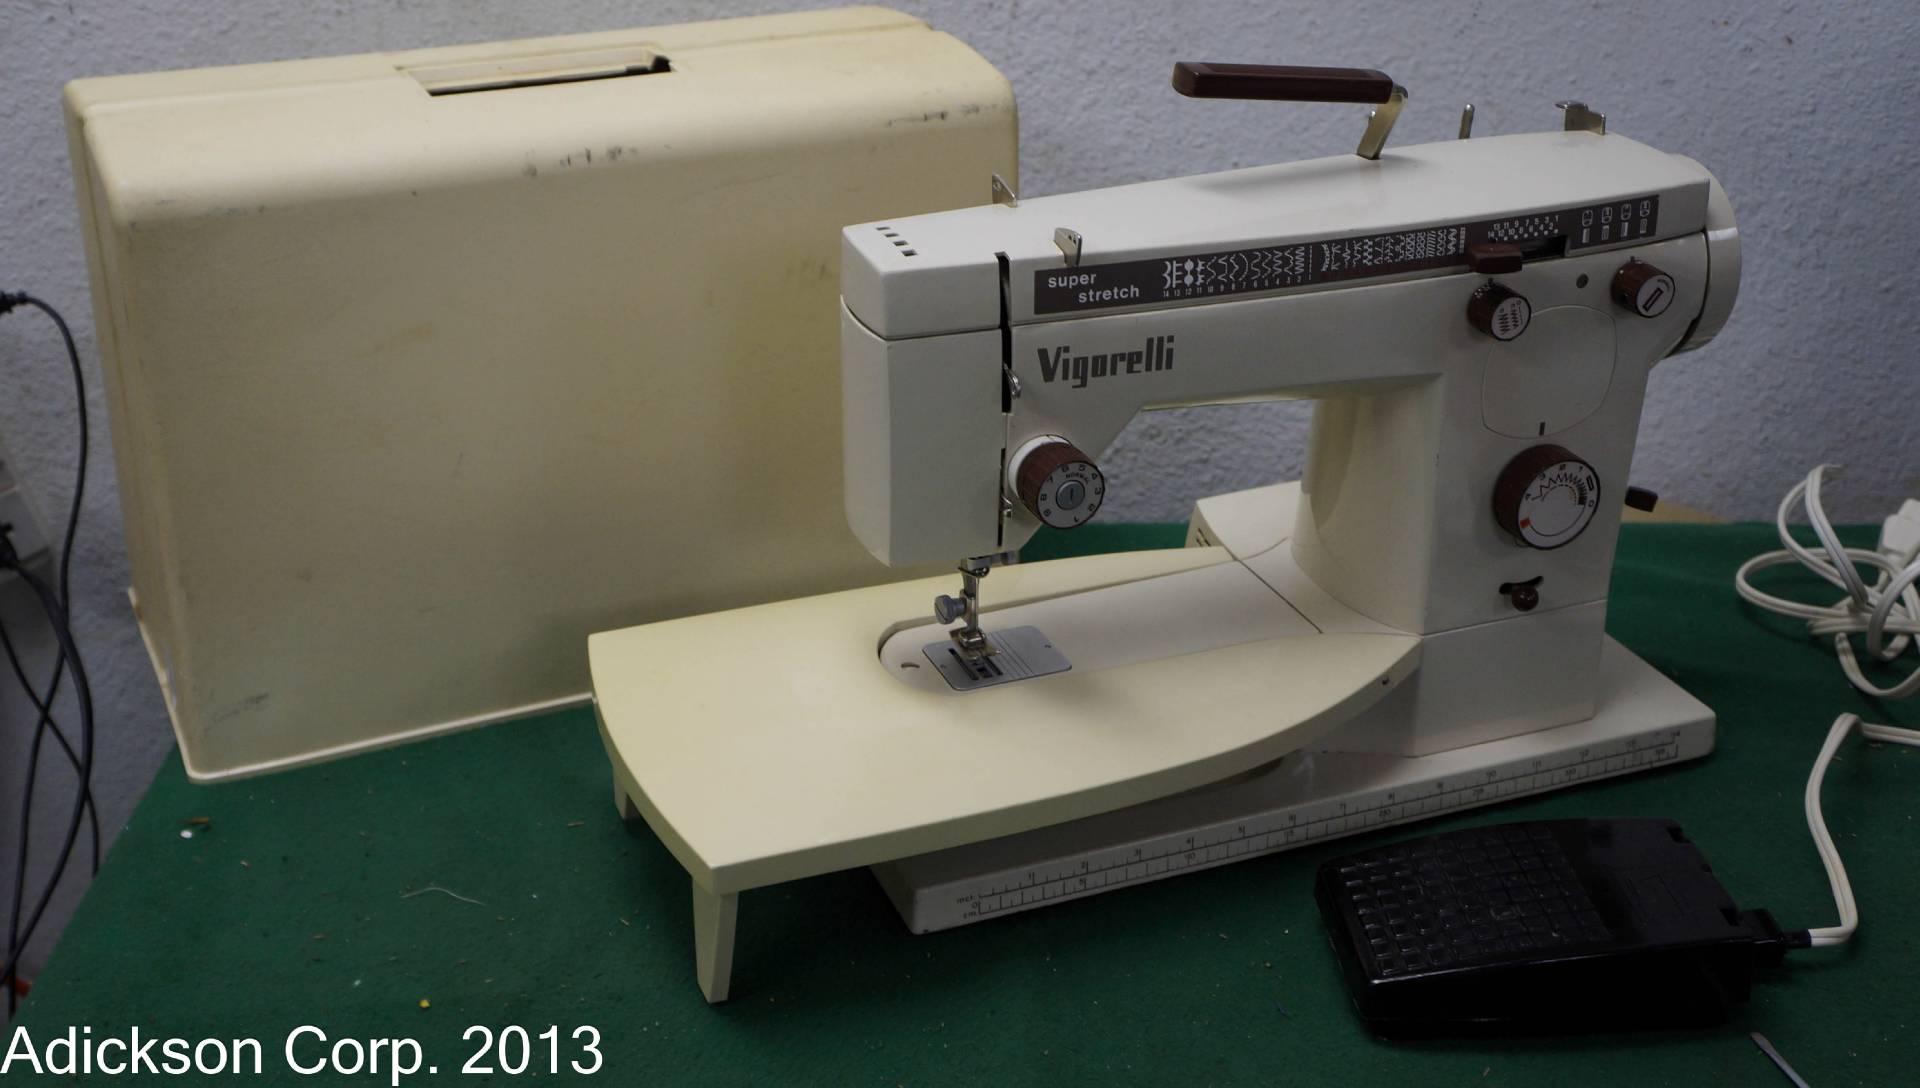 vigorelli sewing machine